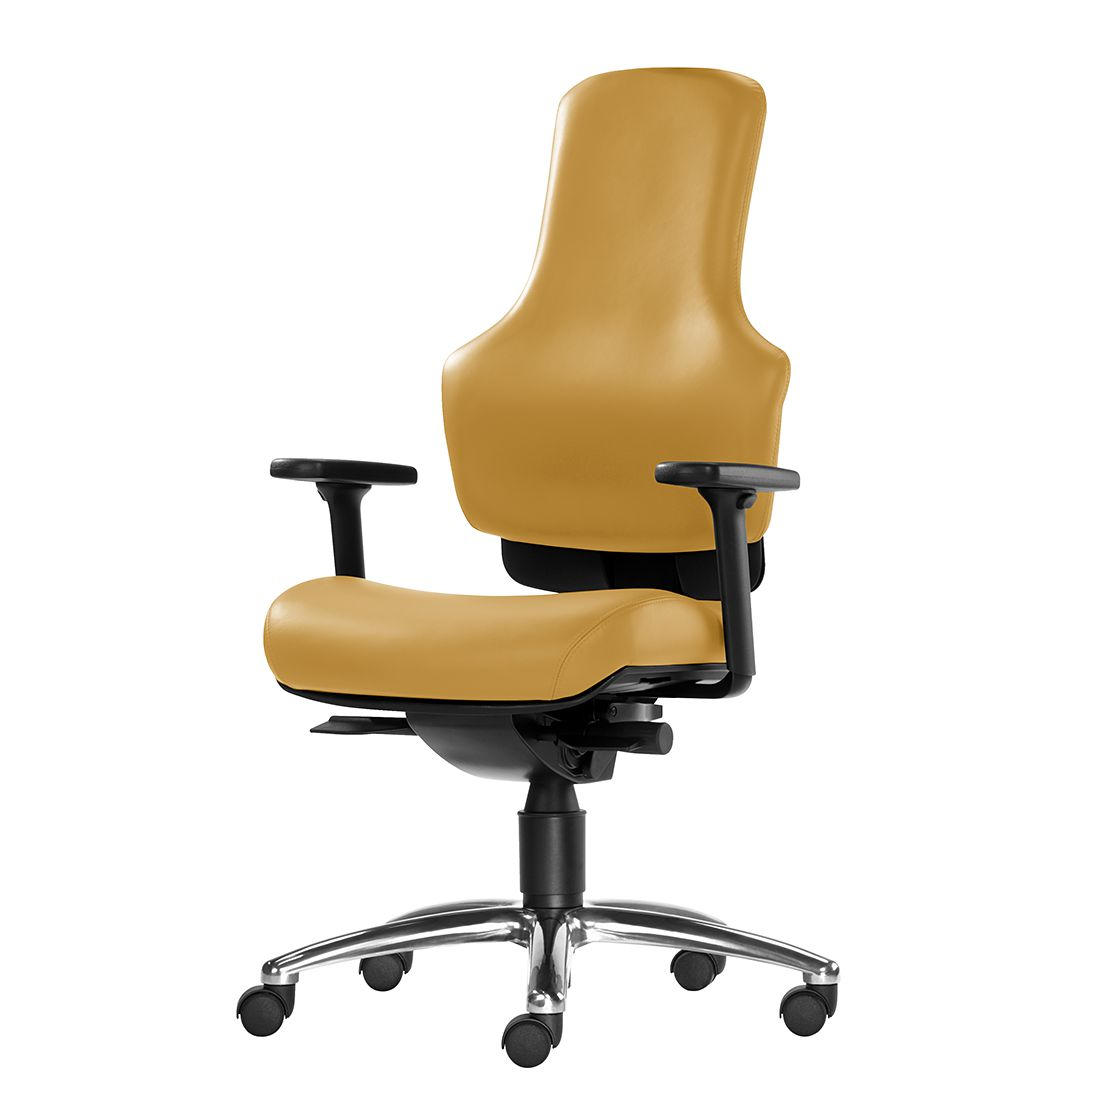 Bürodrehstuhl Ortholetic Balance II – Ohne Kopfstütze – Ocker, 1000 Stühle Gernot-M. Steifensand günstig online kaufen